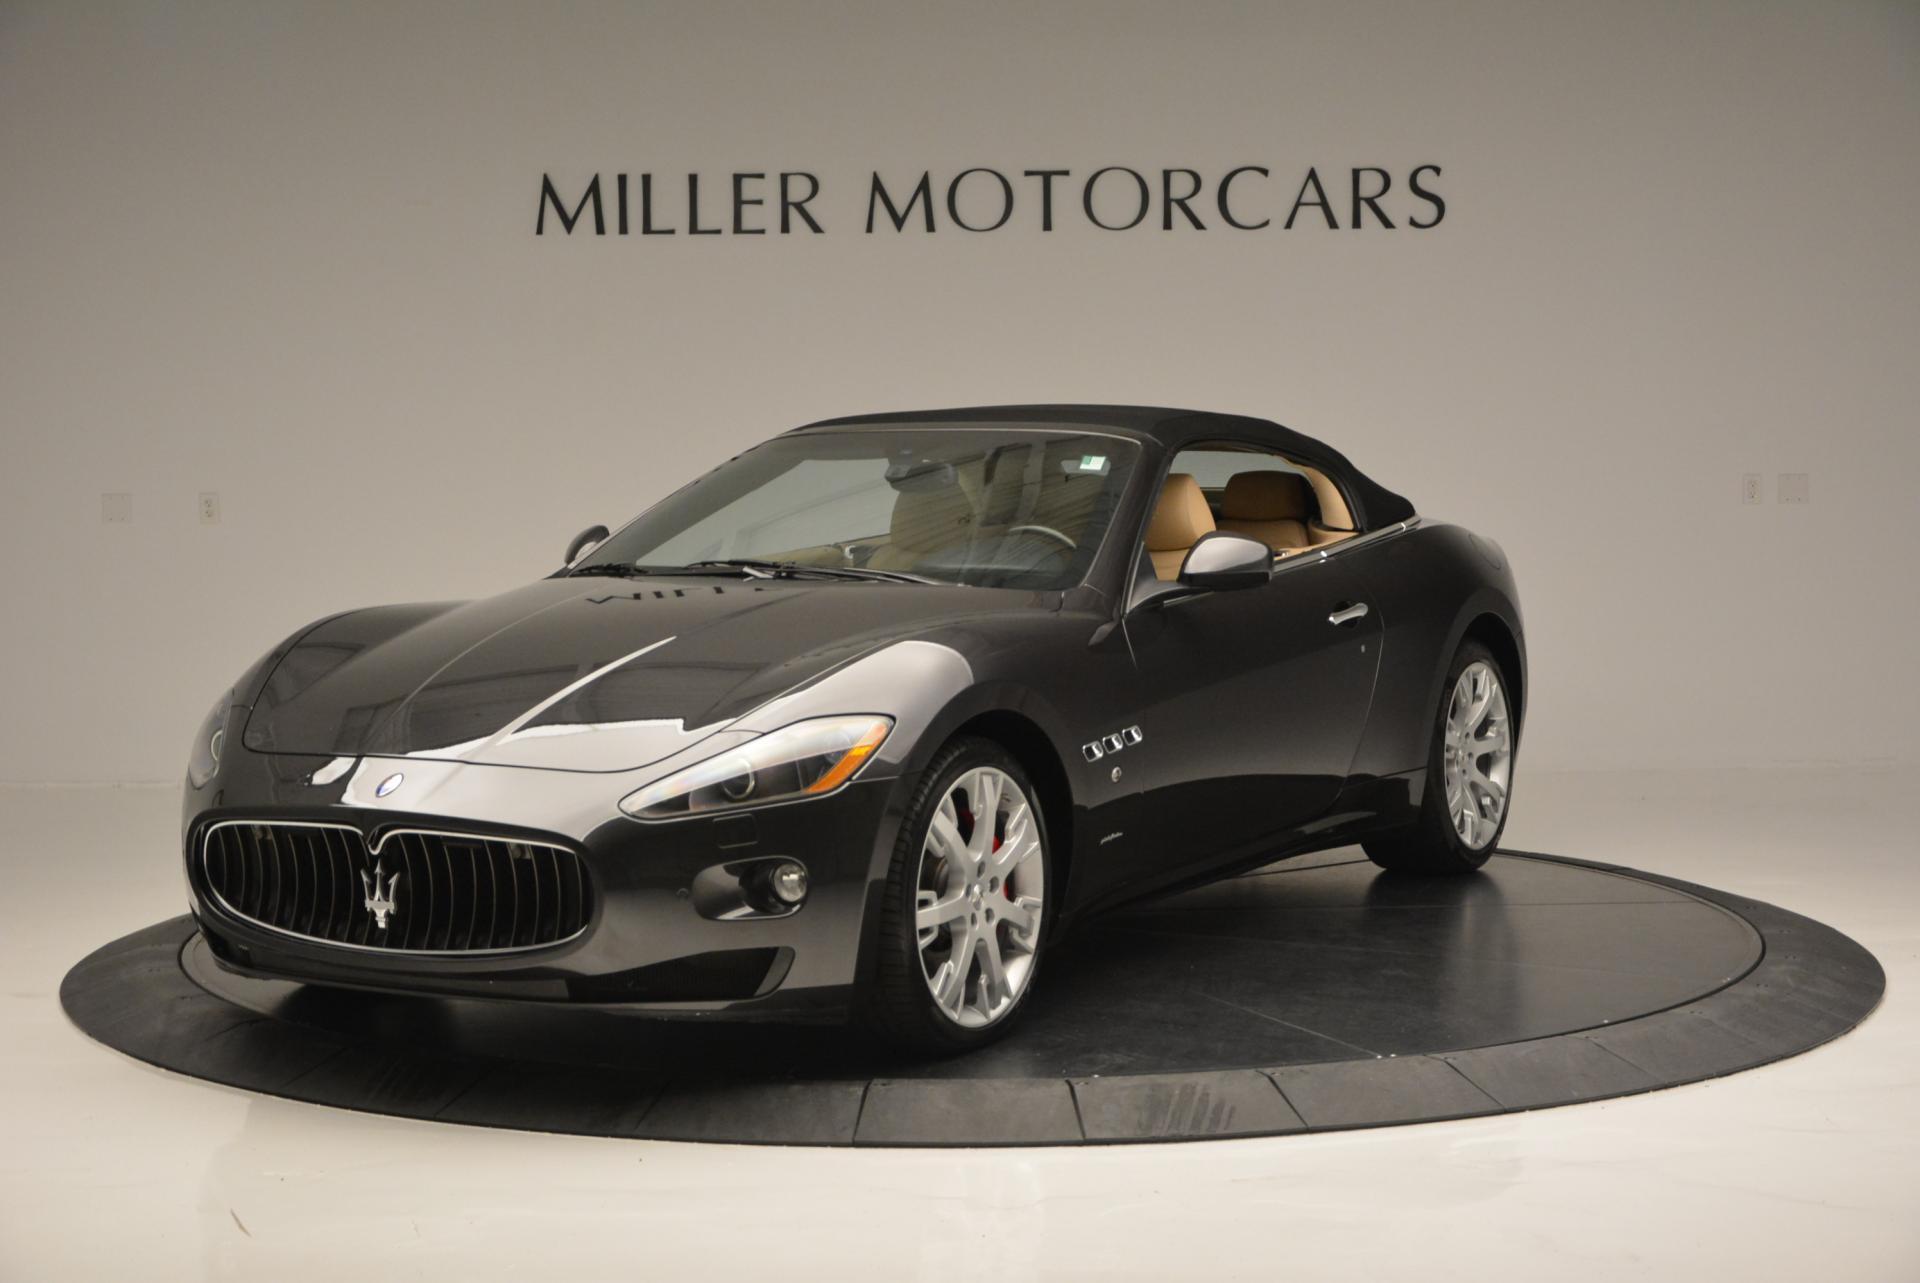 Used 2011 Maserati GranTurismo Base For Sale In Westport, CT 158_p13